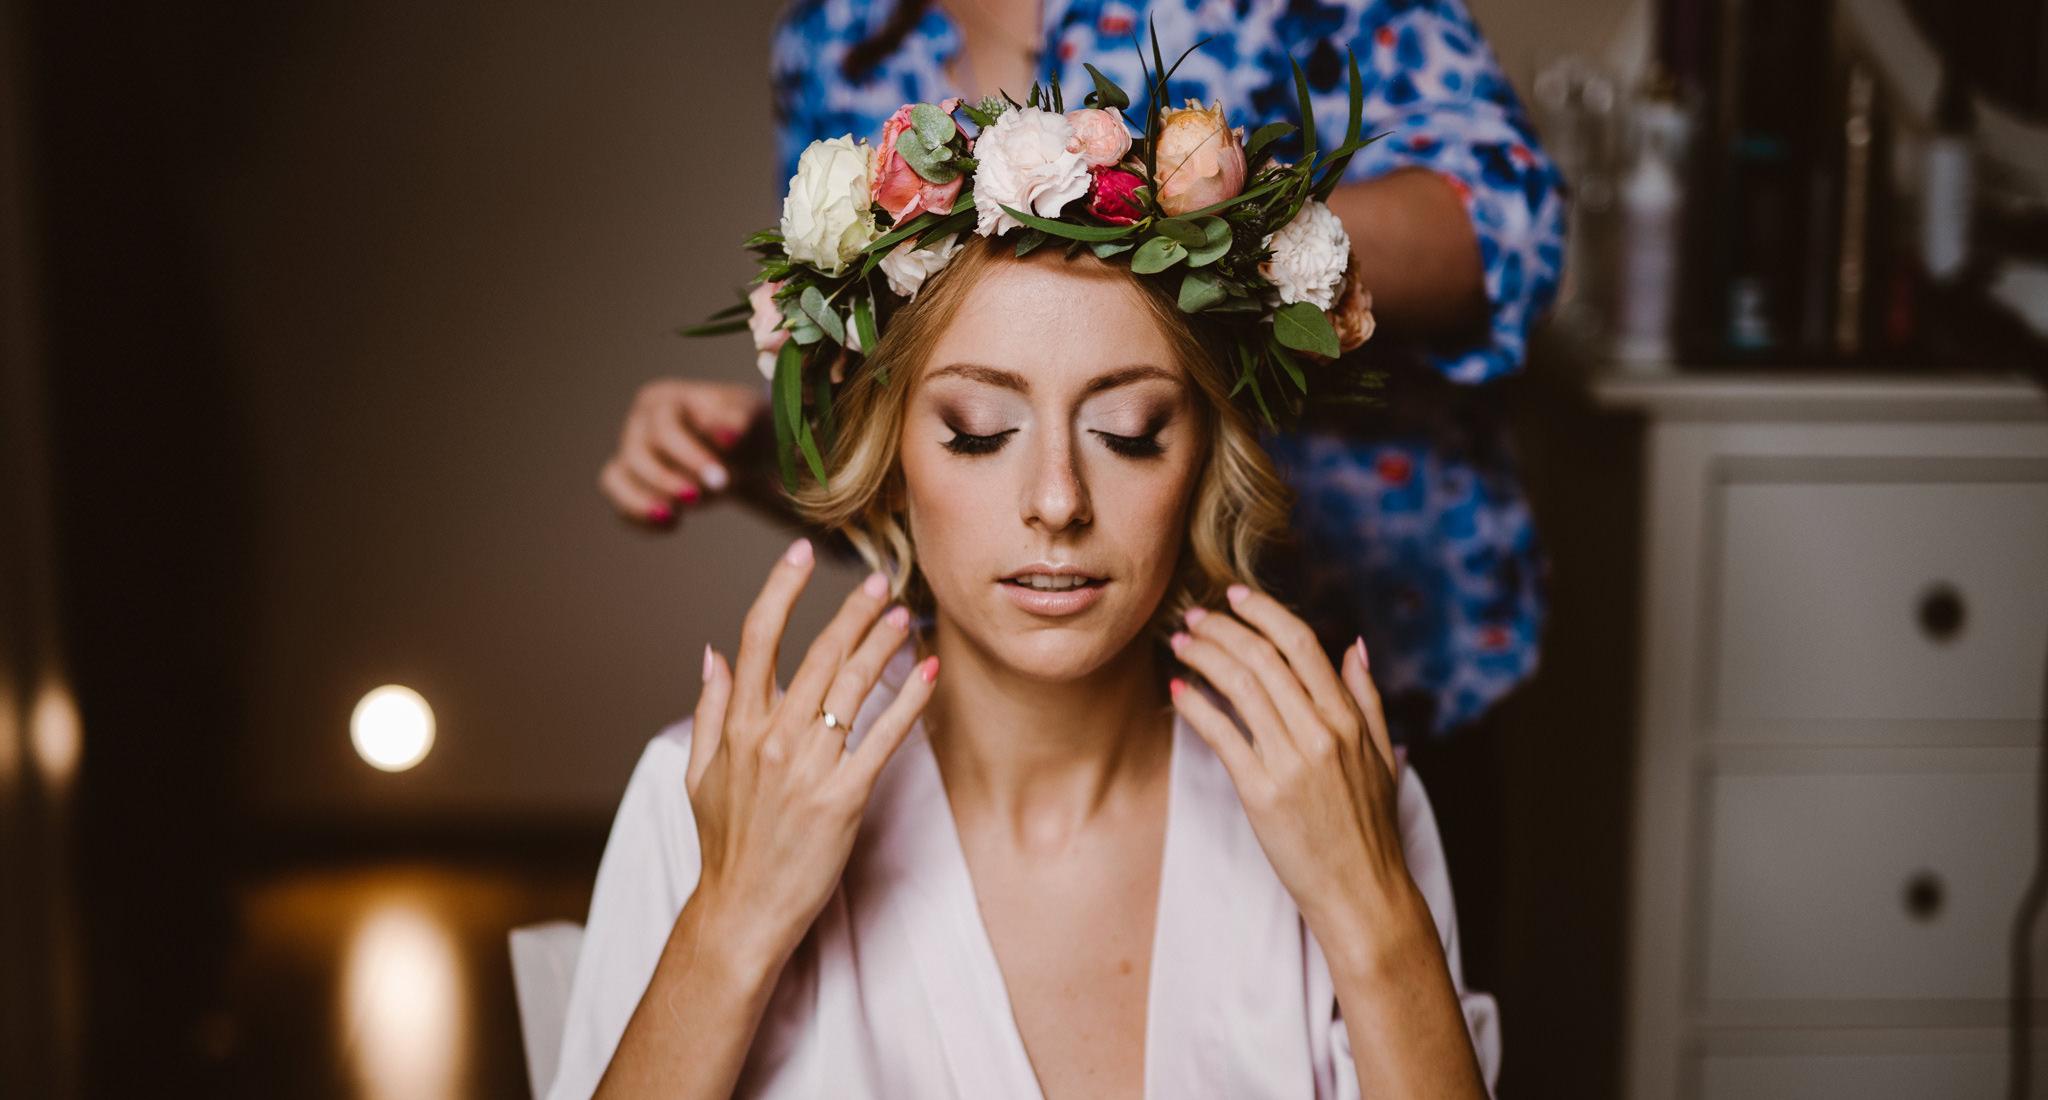 rustylany slub, rustykalne wesele, slow wedding, slub w plenerze, fotografia slubna